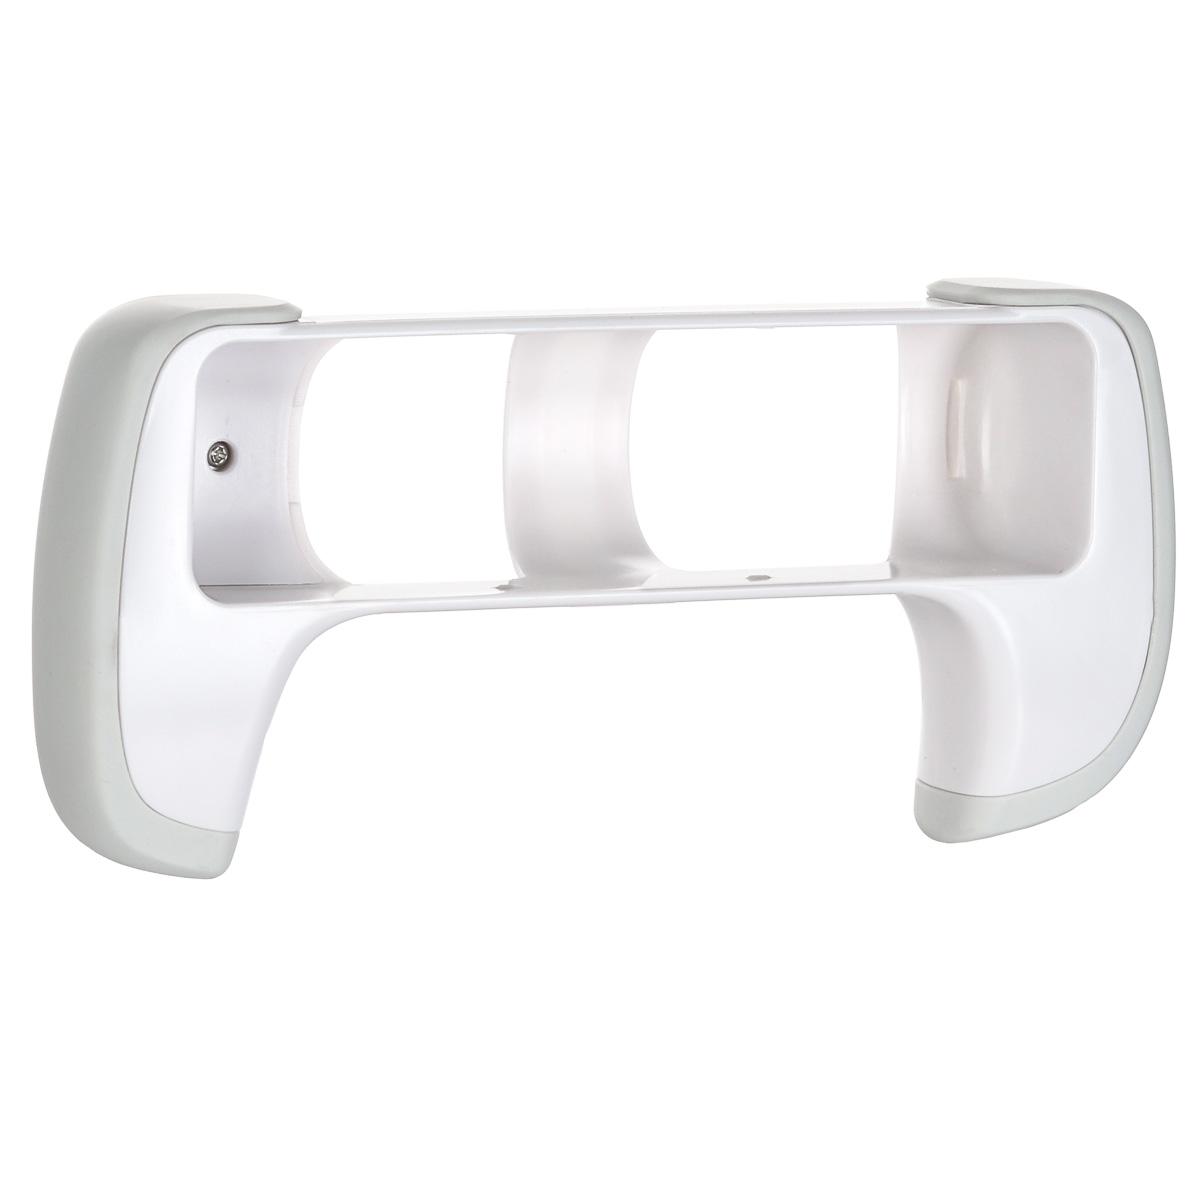 Держатель Black Horns для джойстика Wii (BH-Wii10003)